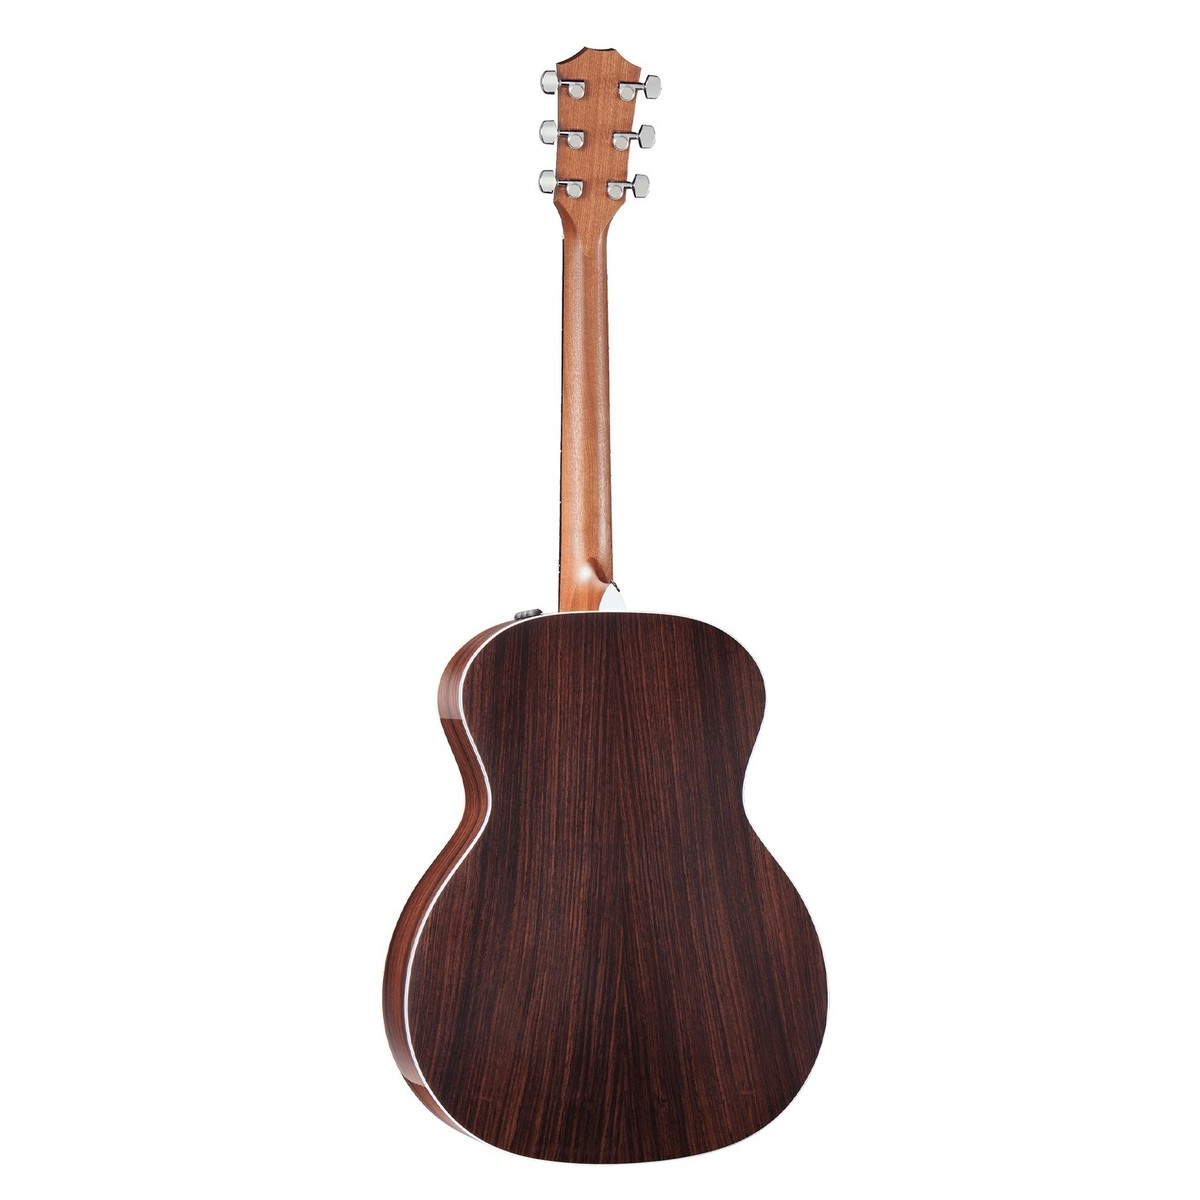 taylor 214e dlx grand auditorium lh puoliakustinen kitara 2017 osoitteessa. Black Bedroom Furniture Sets. Home Design Ideas